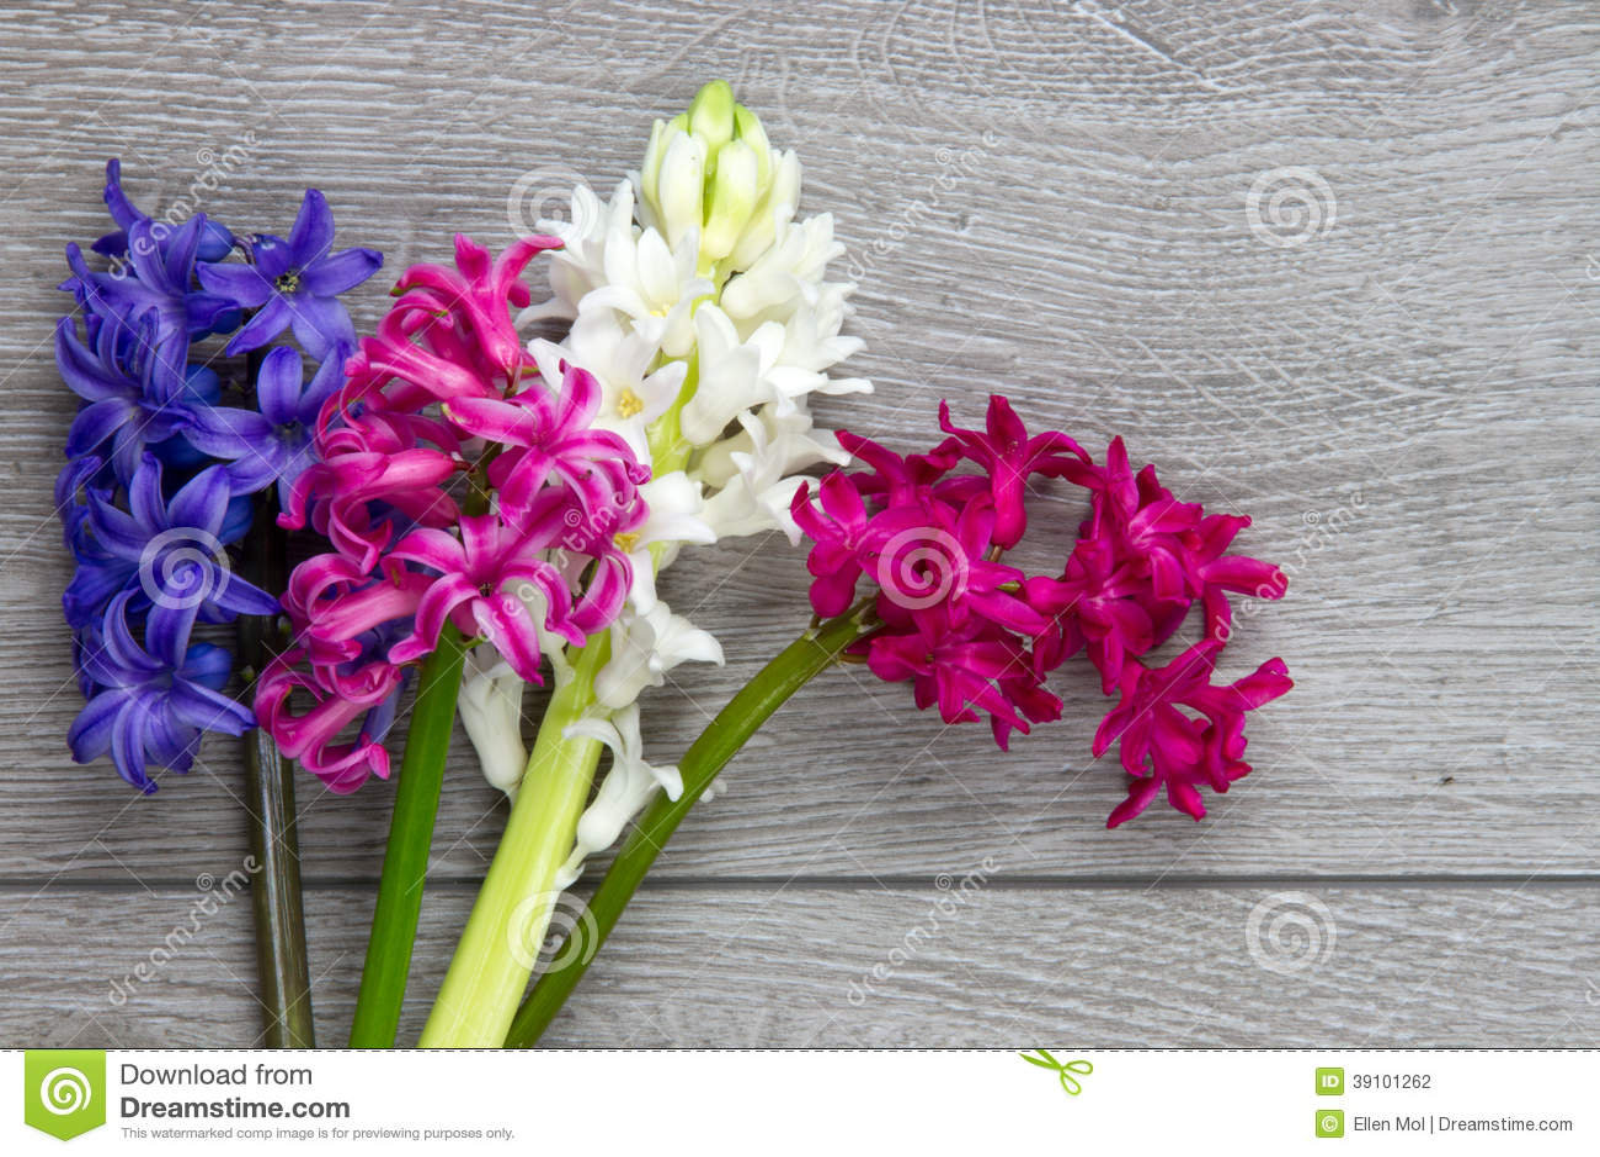 Bos van hyacintbloemen